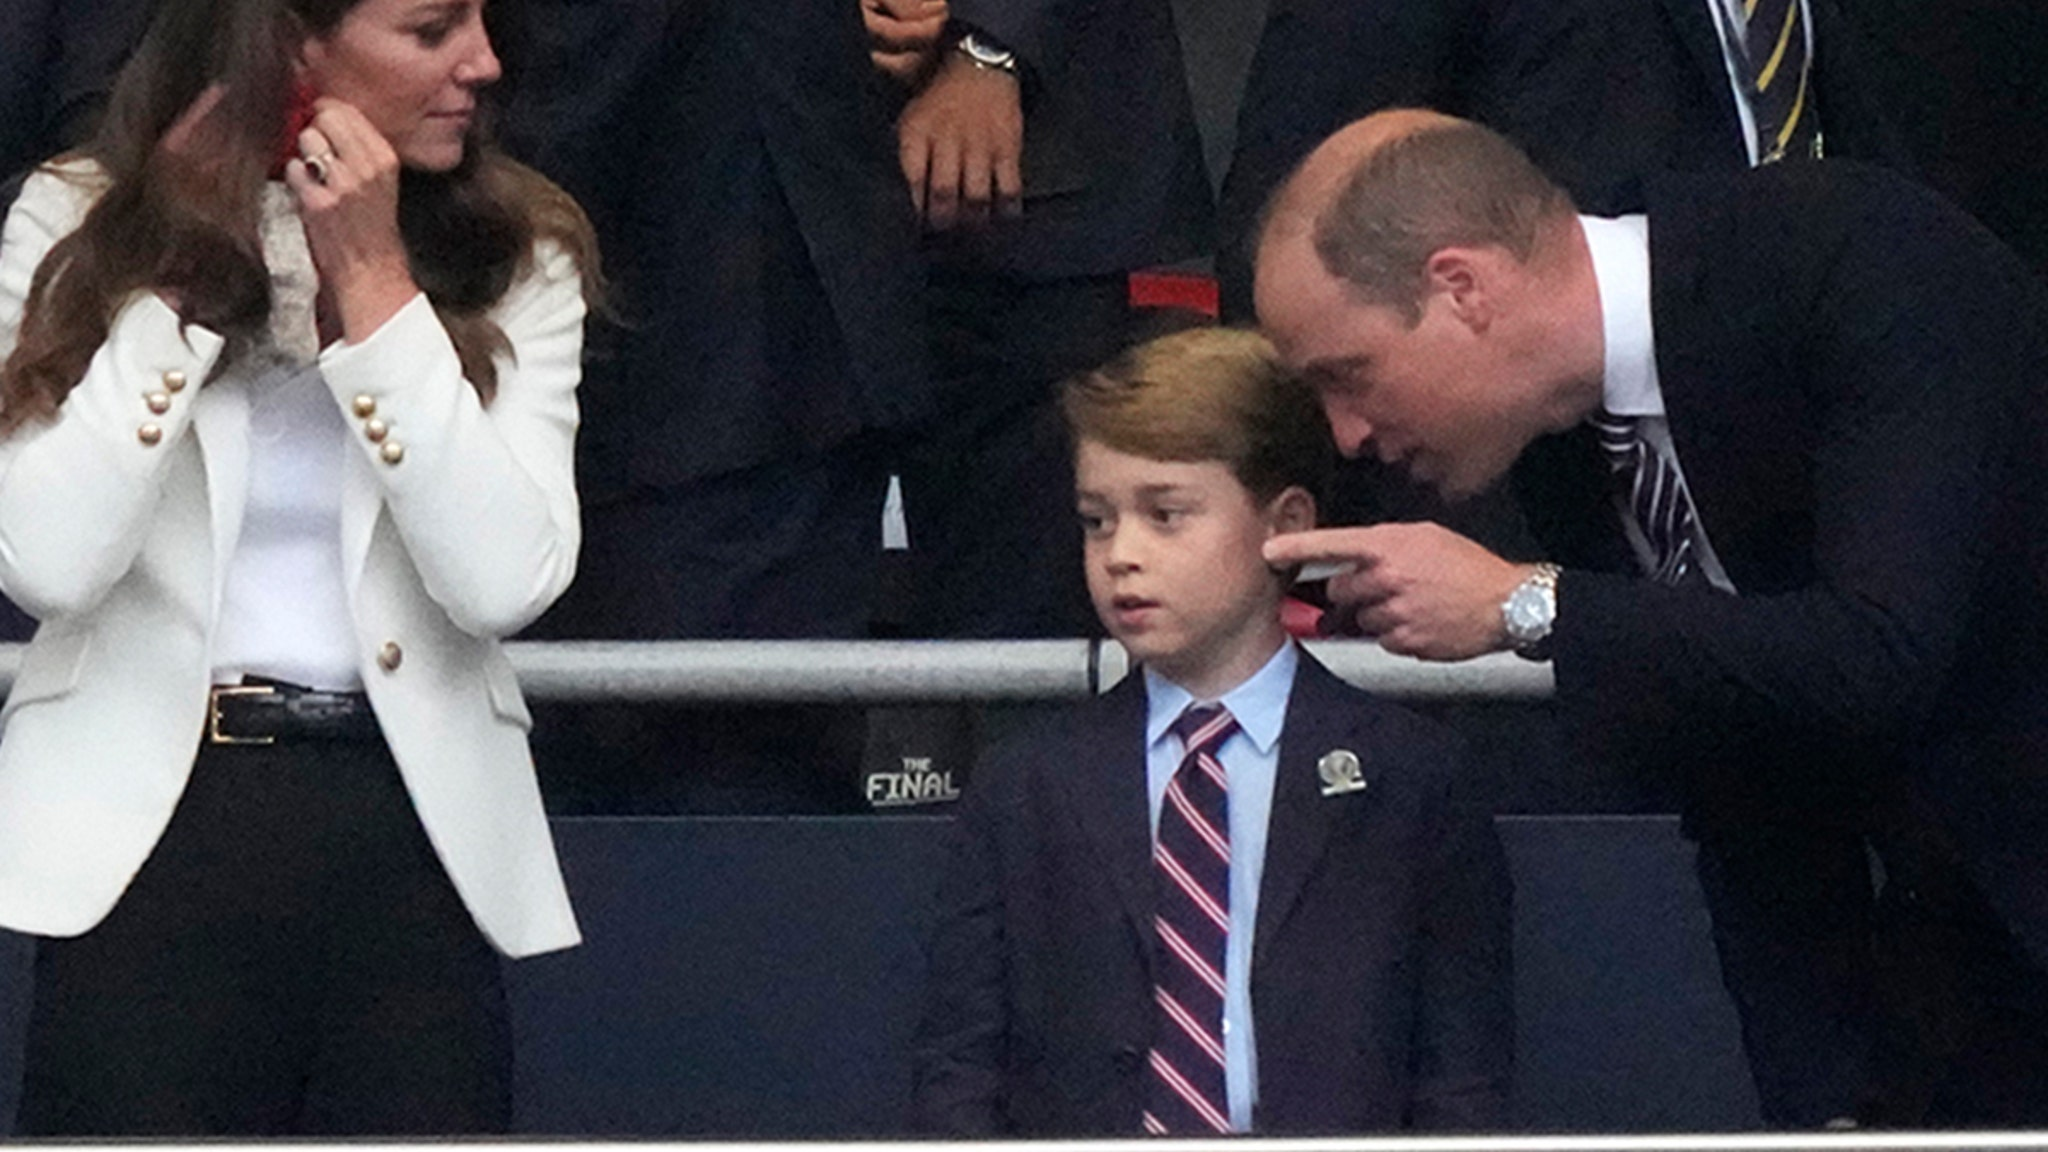 Prince George Enjoys UEFA 2020 Soccer Final with Mom & Dad – TMZ